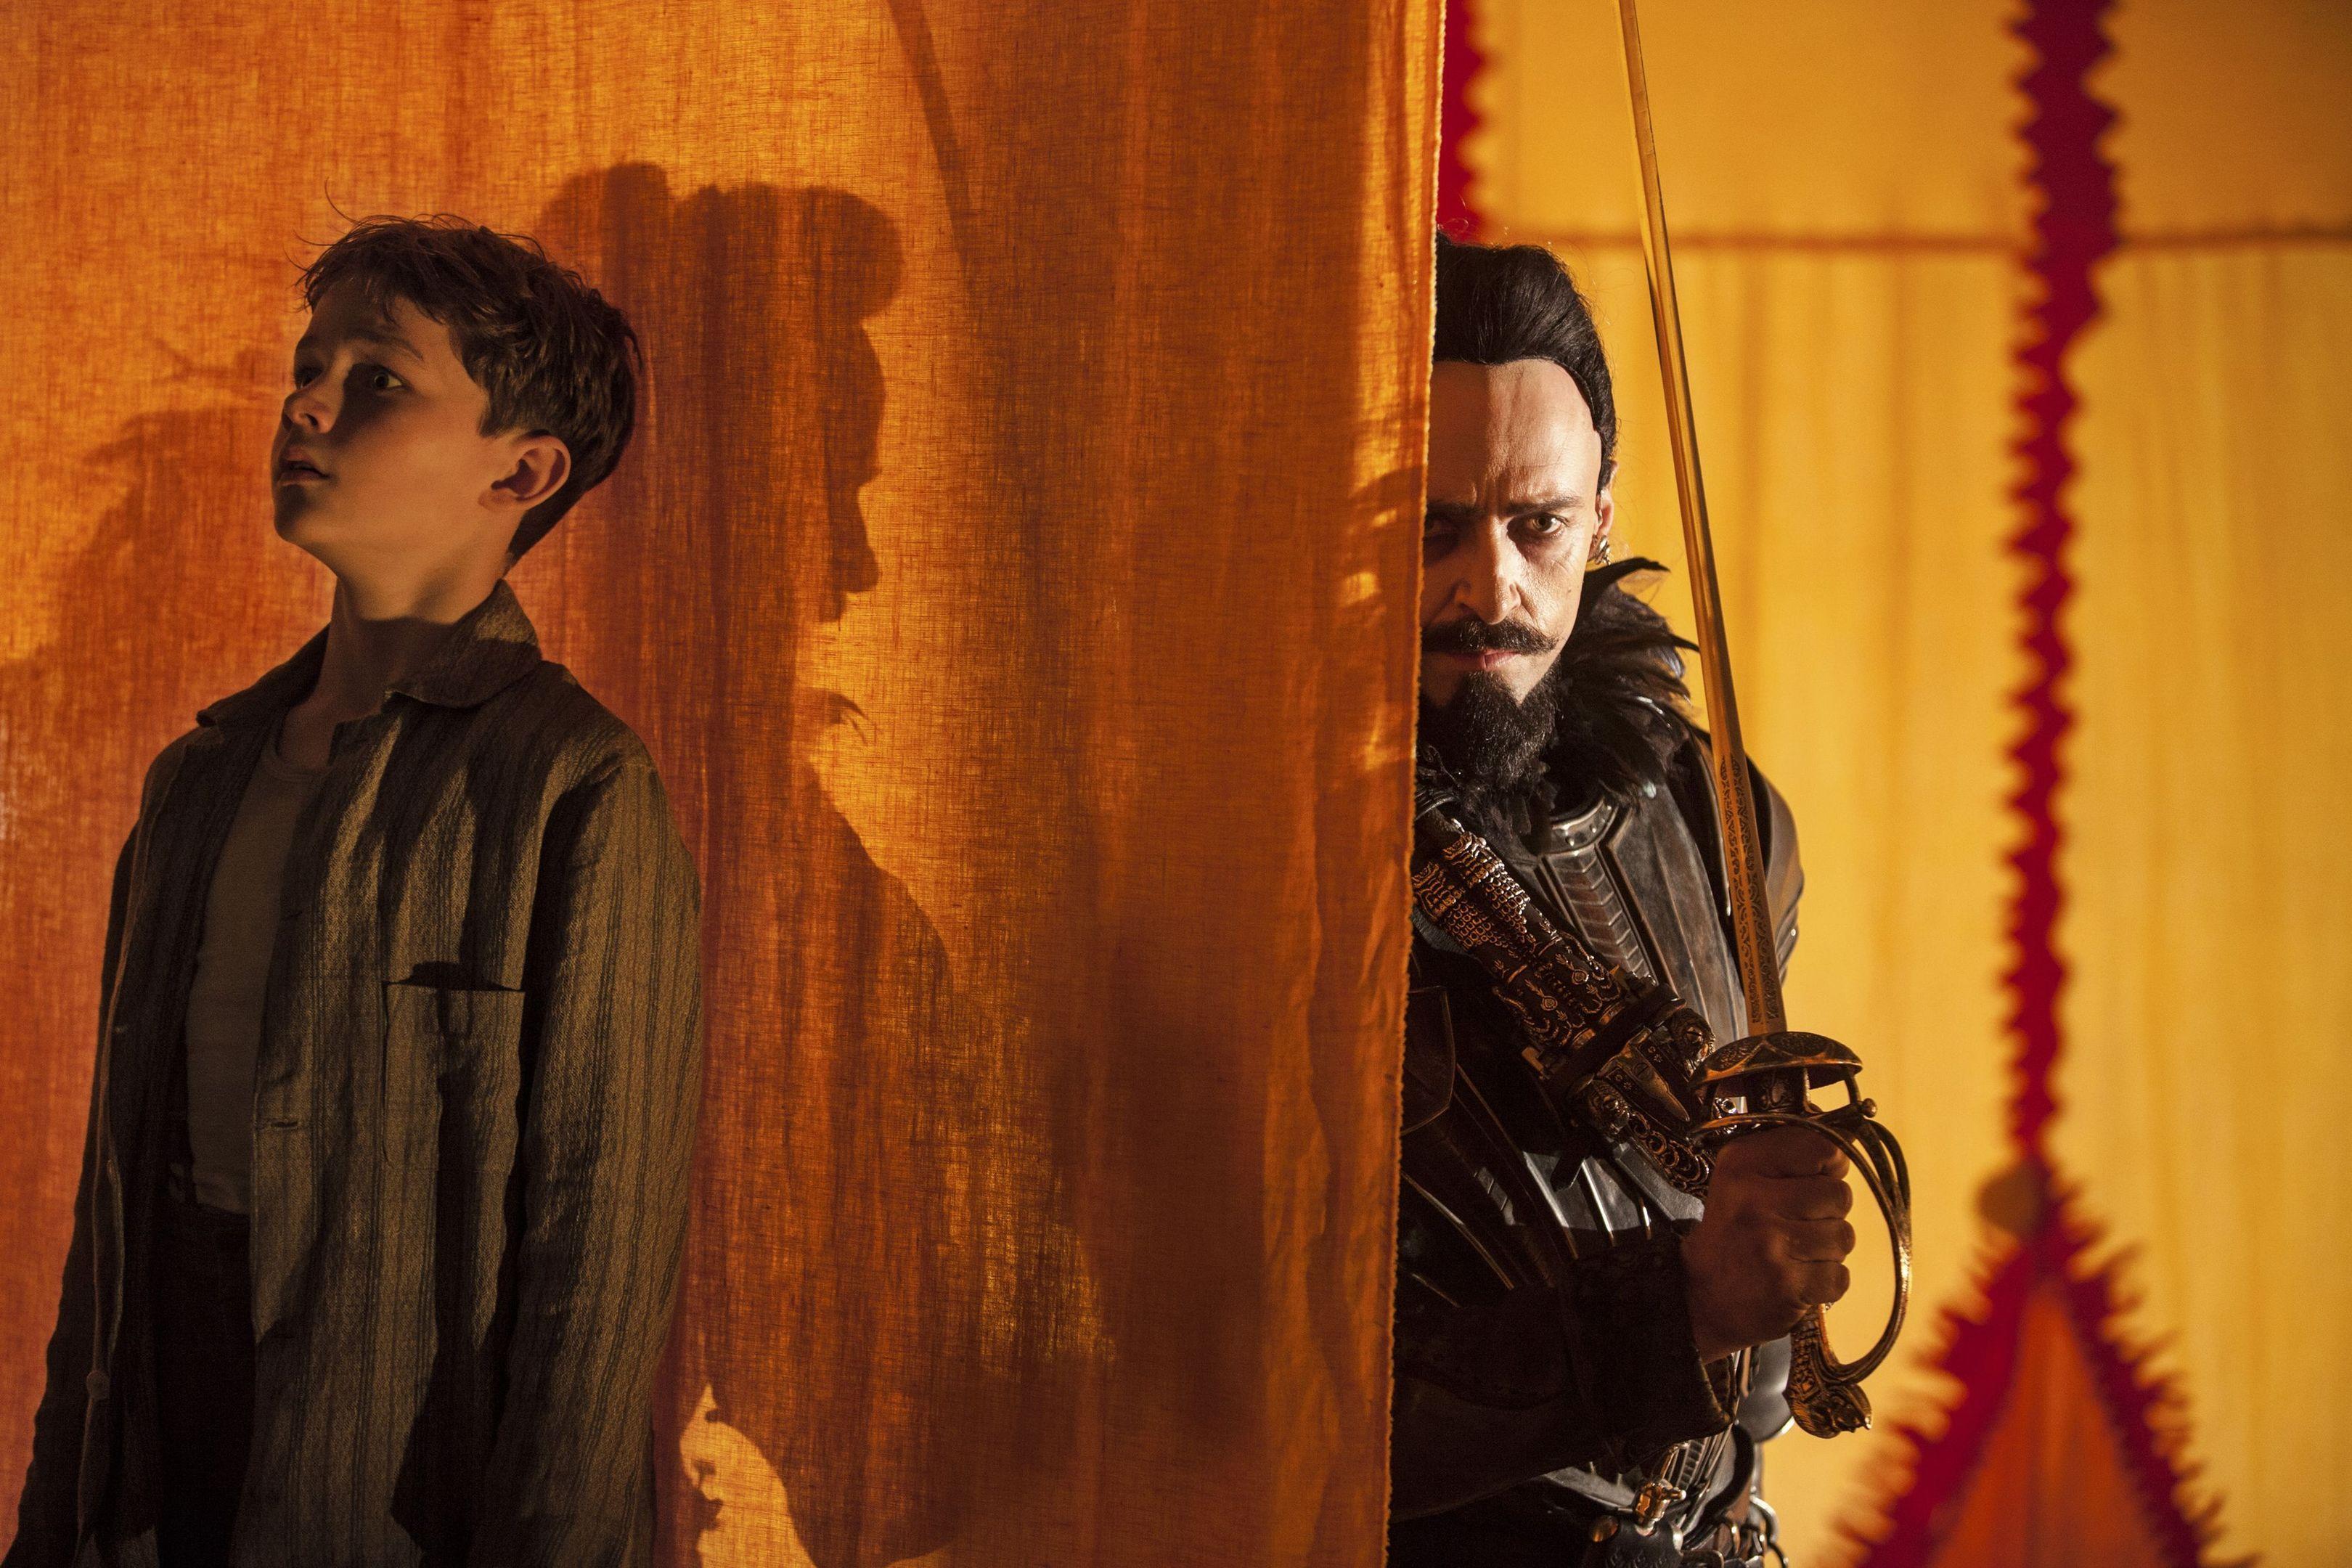 Peter Pan (Levi Miller) hides from Blackbeard (Hugh Jackman)  in a scene from Pan.